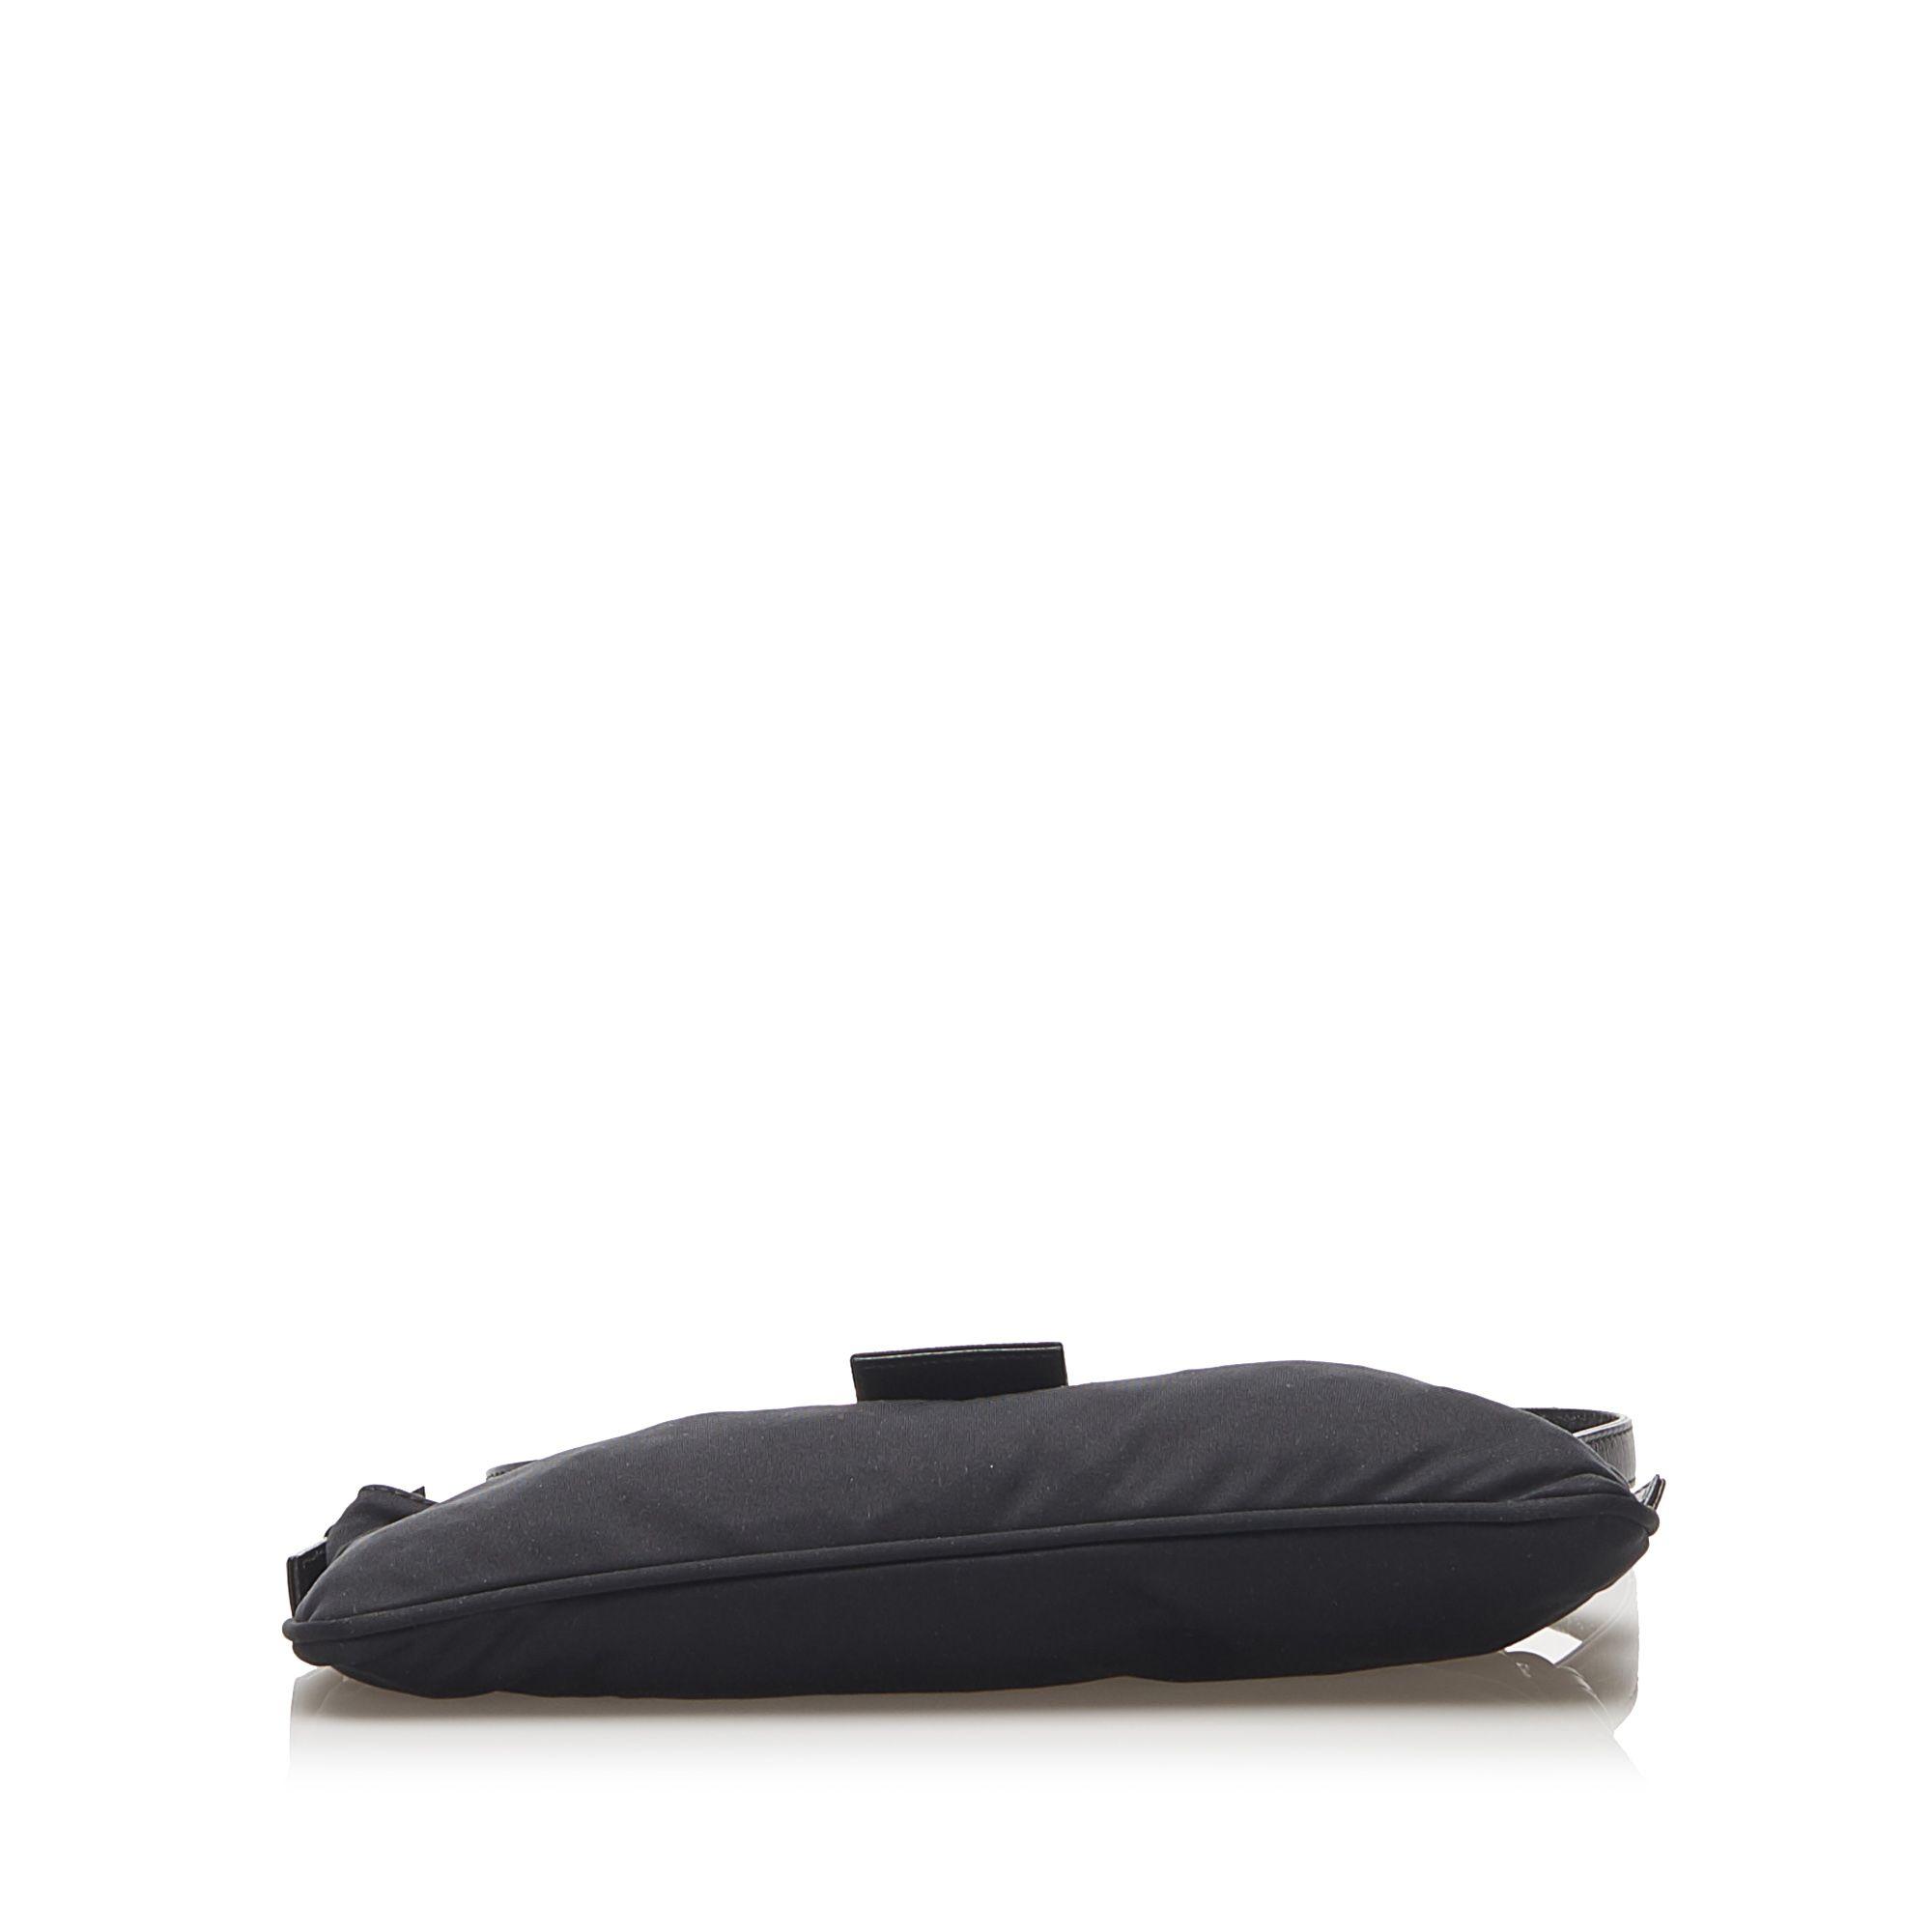 Vintage Fendi Cotton Crossbody Bag Black